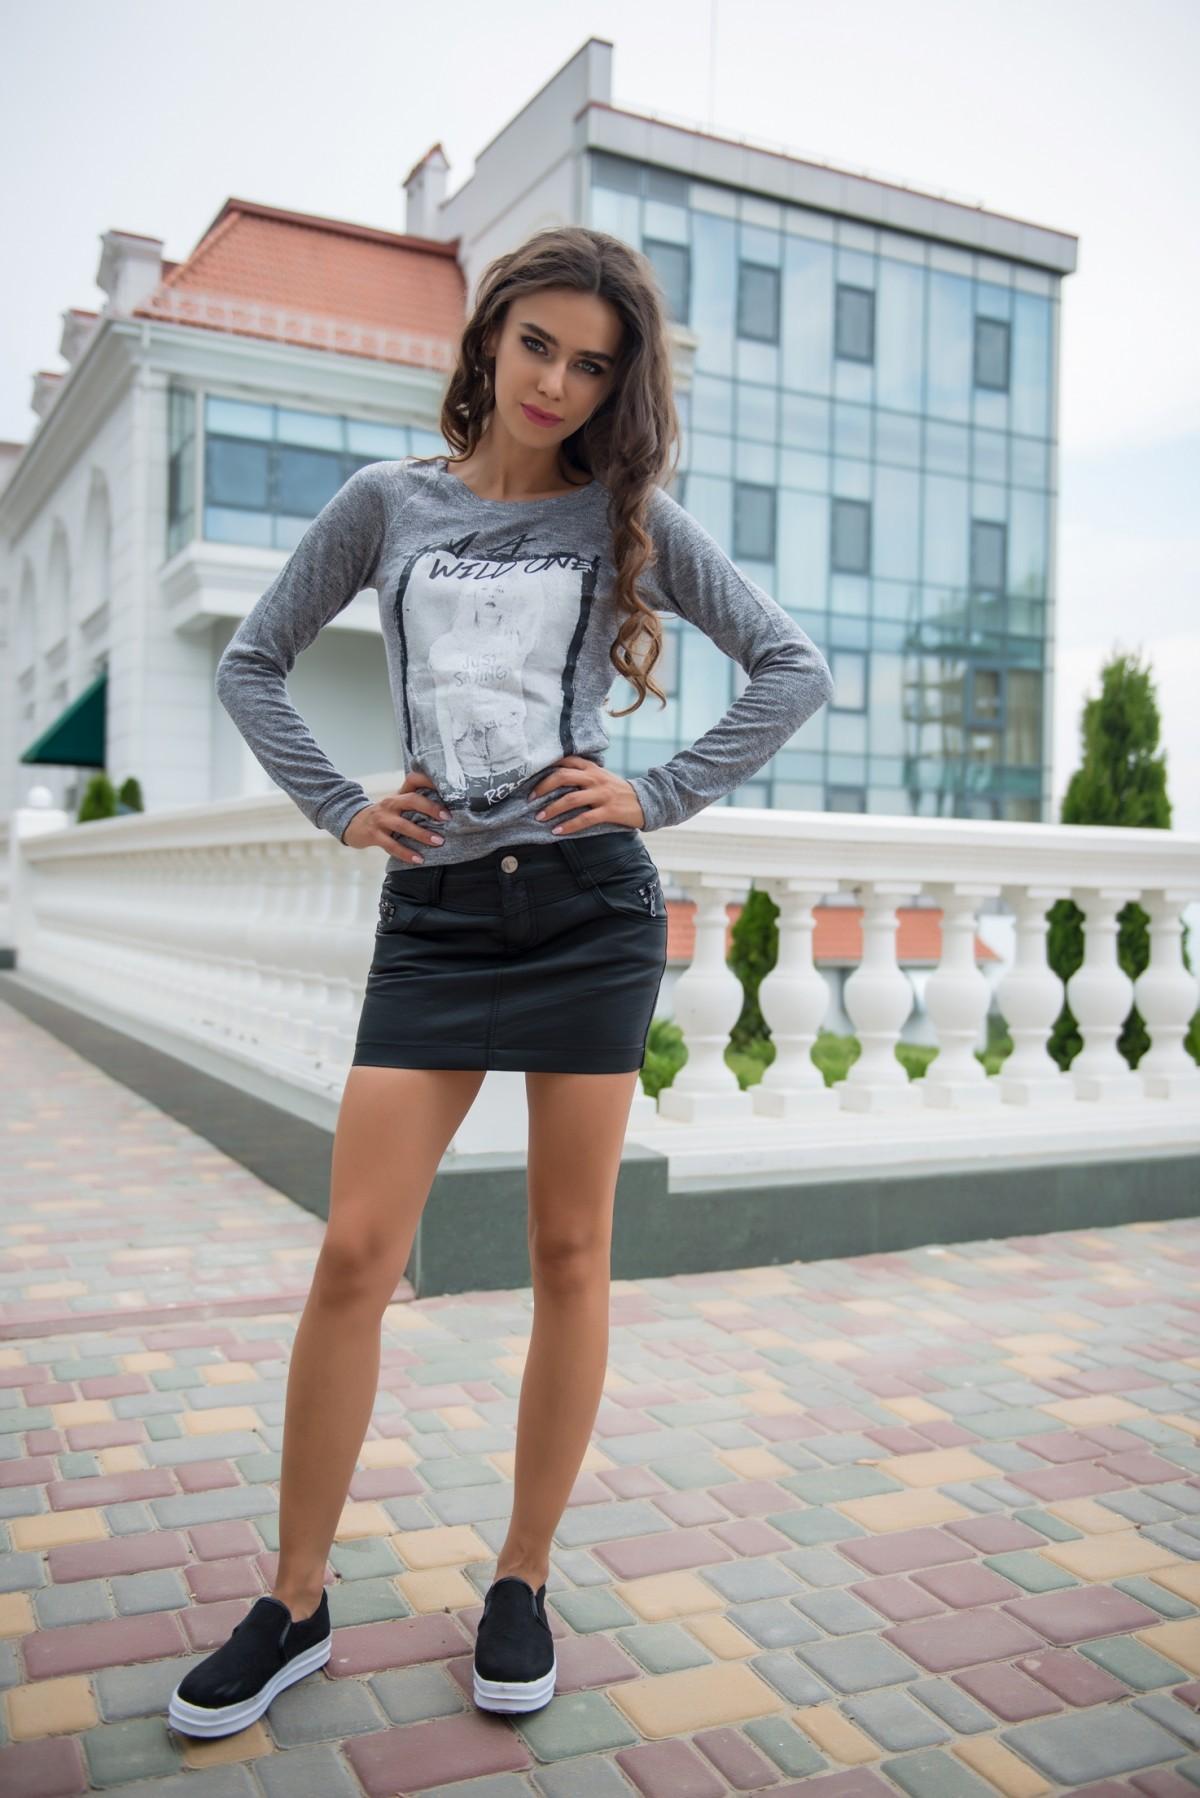 Фото девушки в черной мини юбке